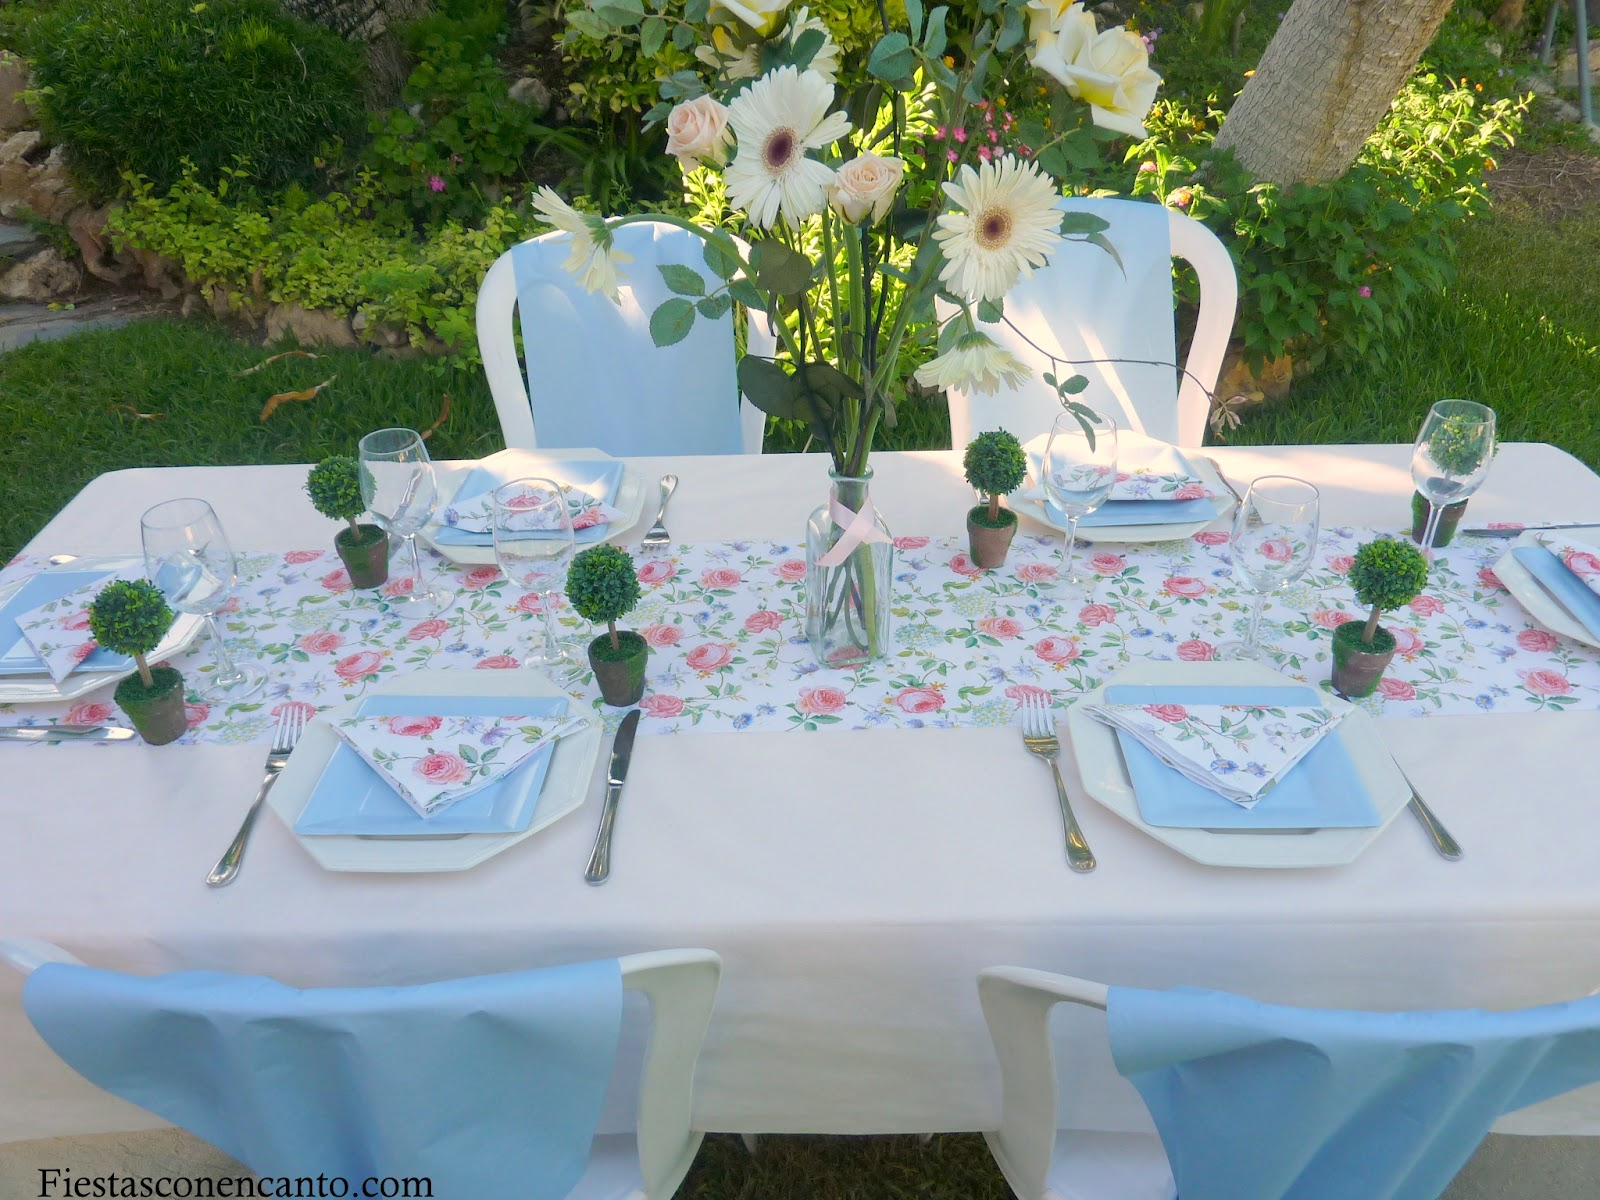 Fiestas con encanto buffet bautizo o comuni n econ mico for Decoracion bautizo en casa